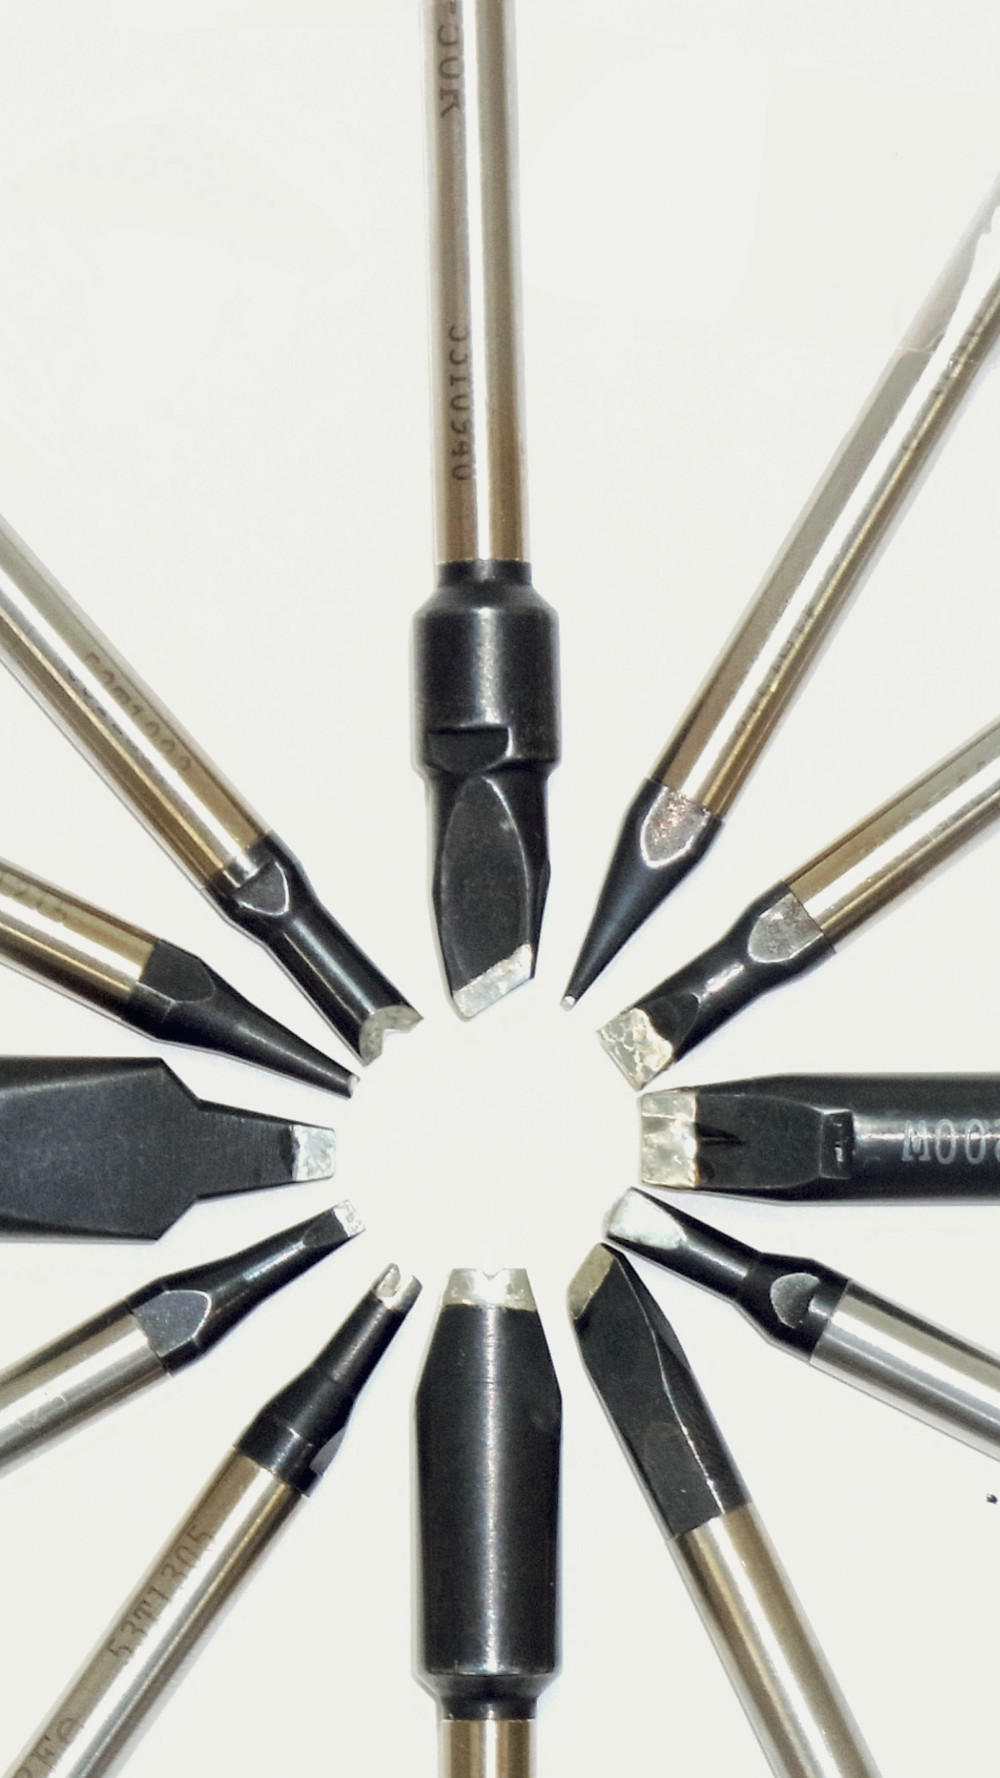 iron_soldering_tips.jpg